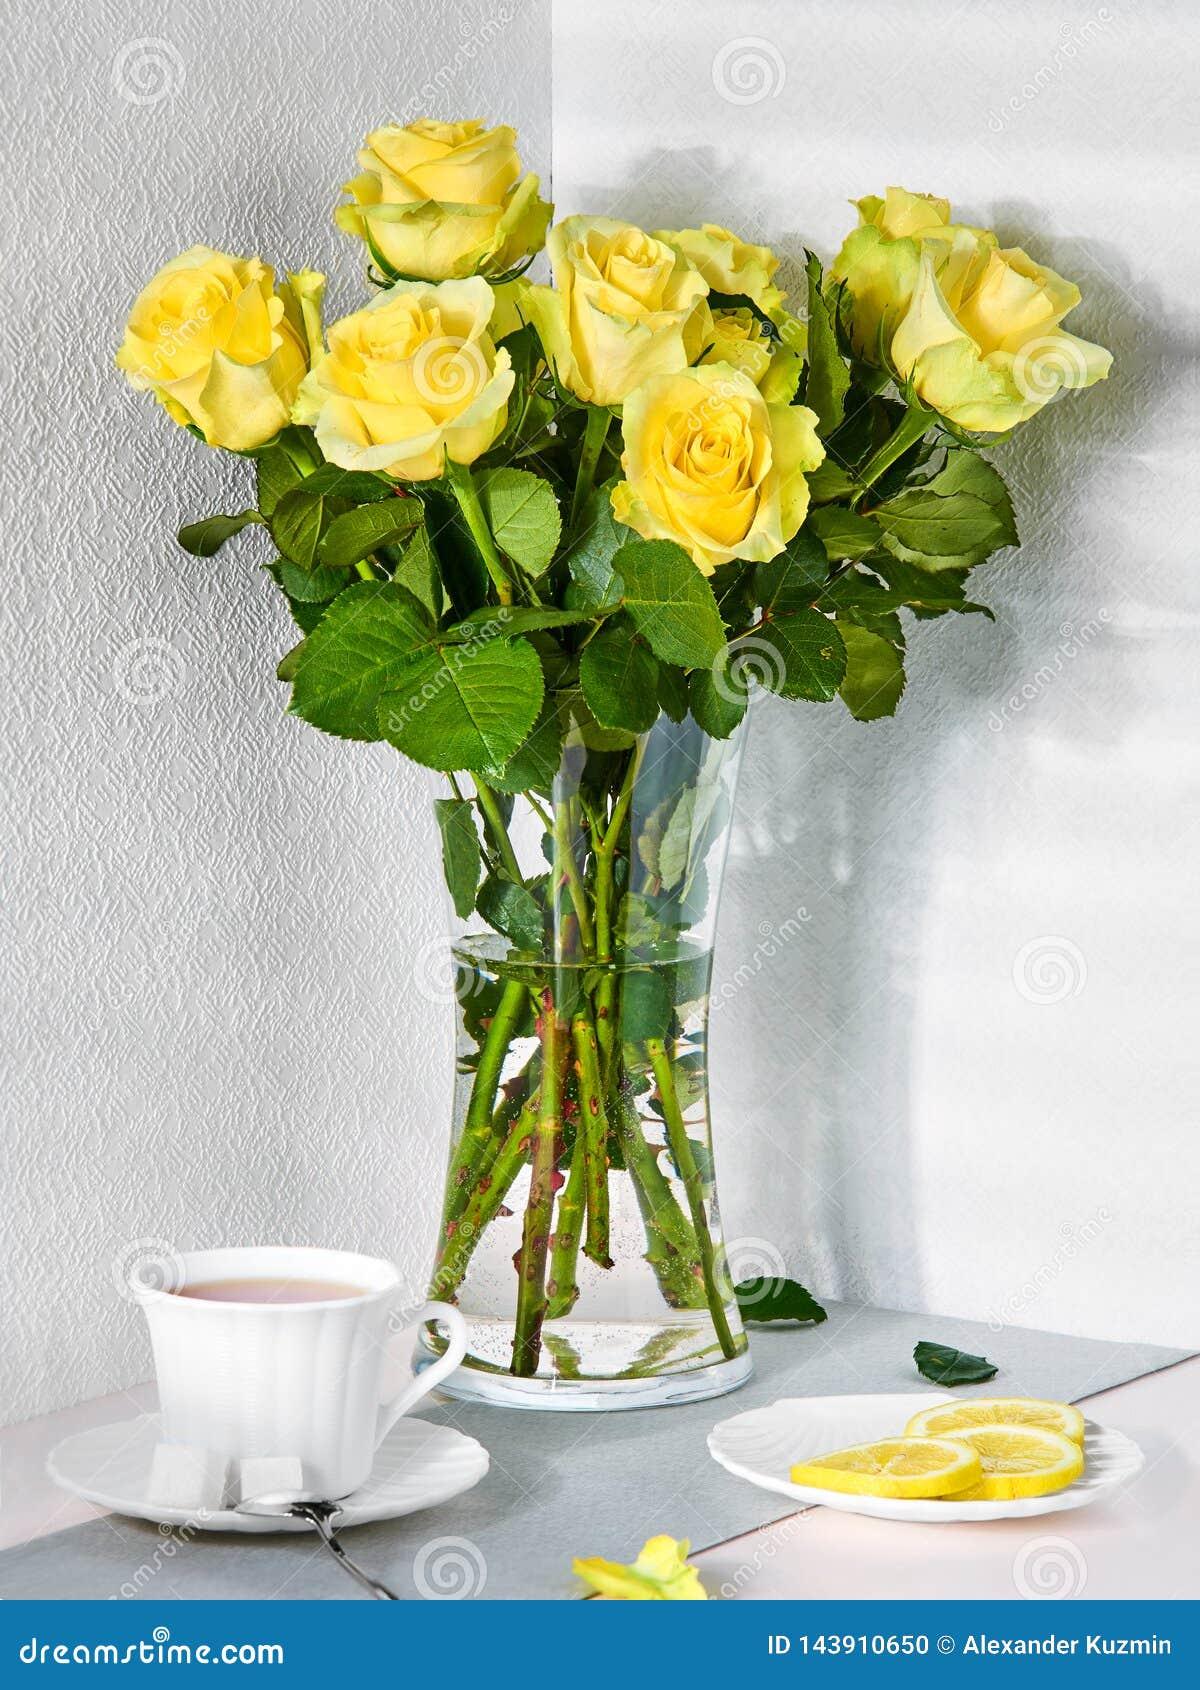 Натюрморт с букетом желтых роз и чашки чаю